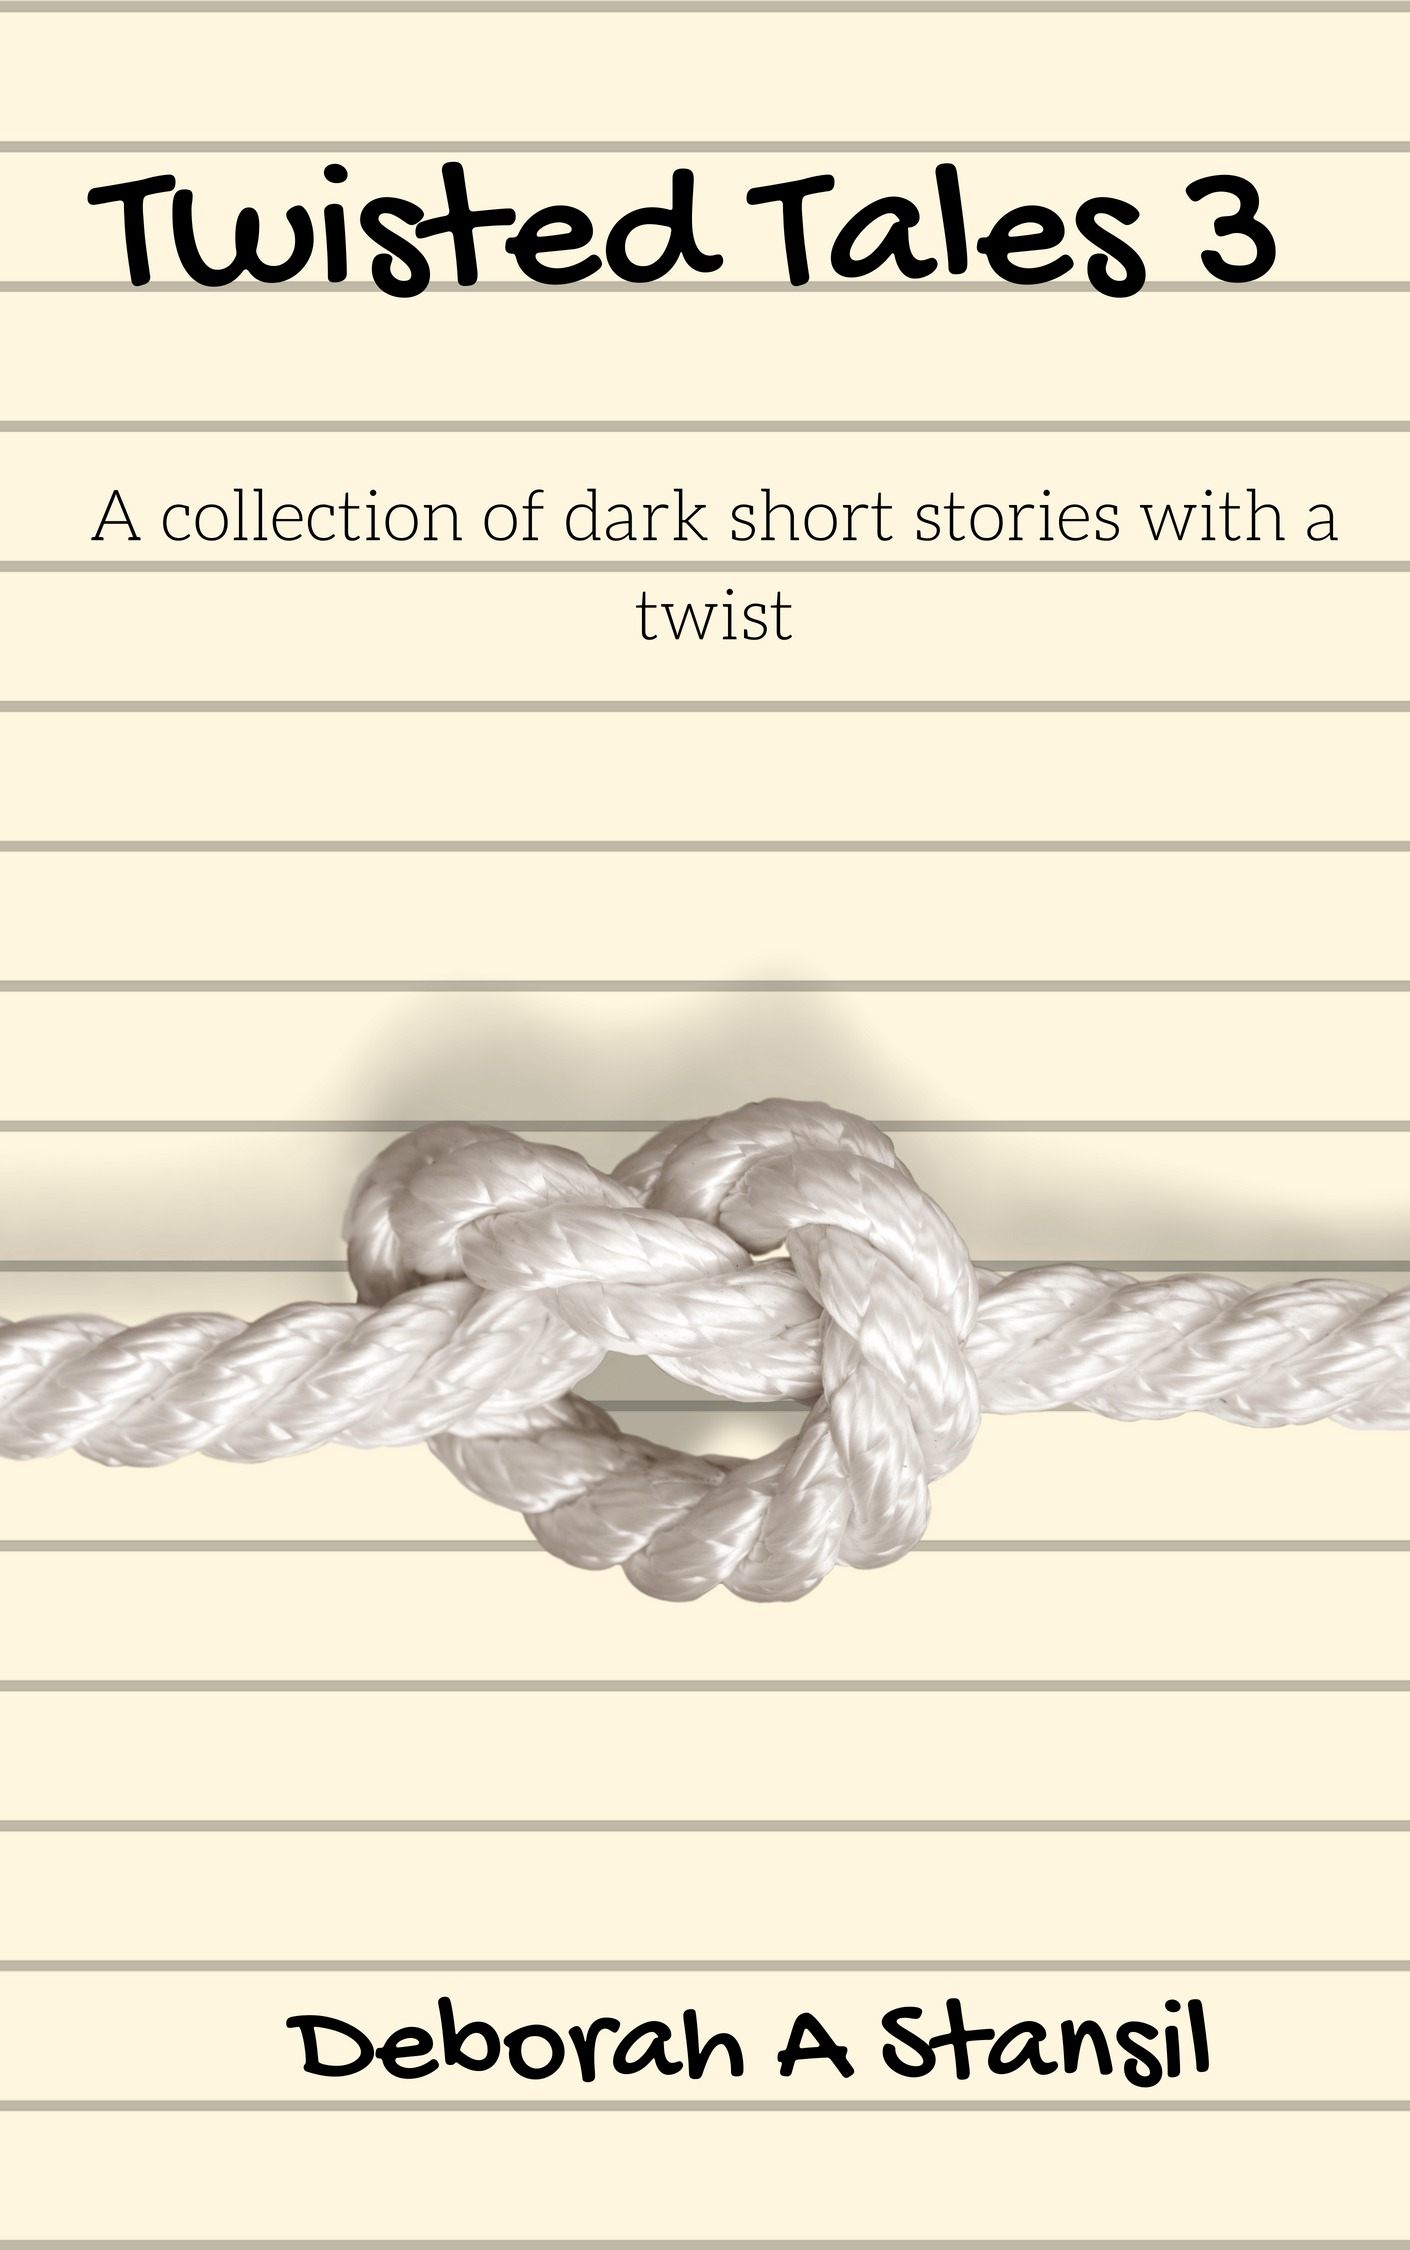 horror Archives - My Random Musings